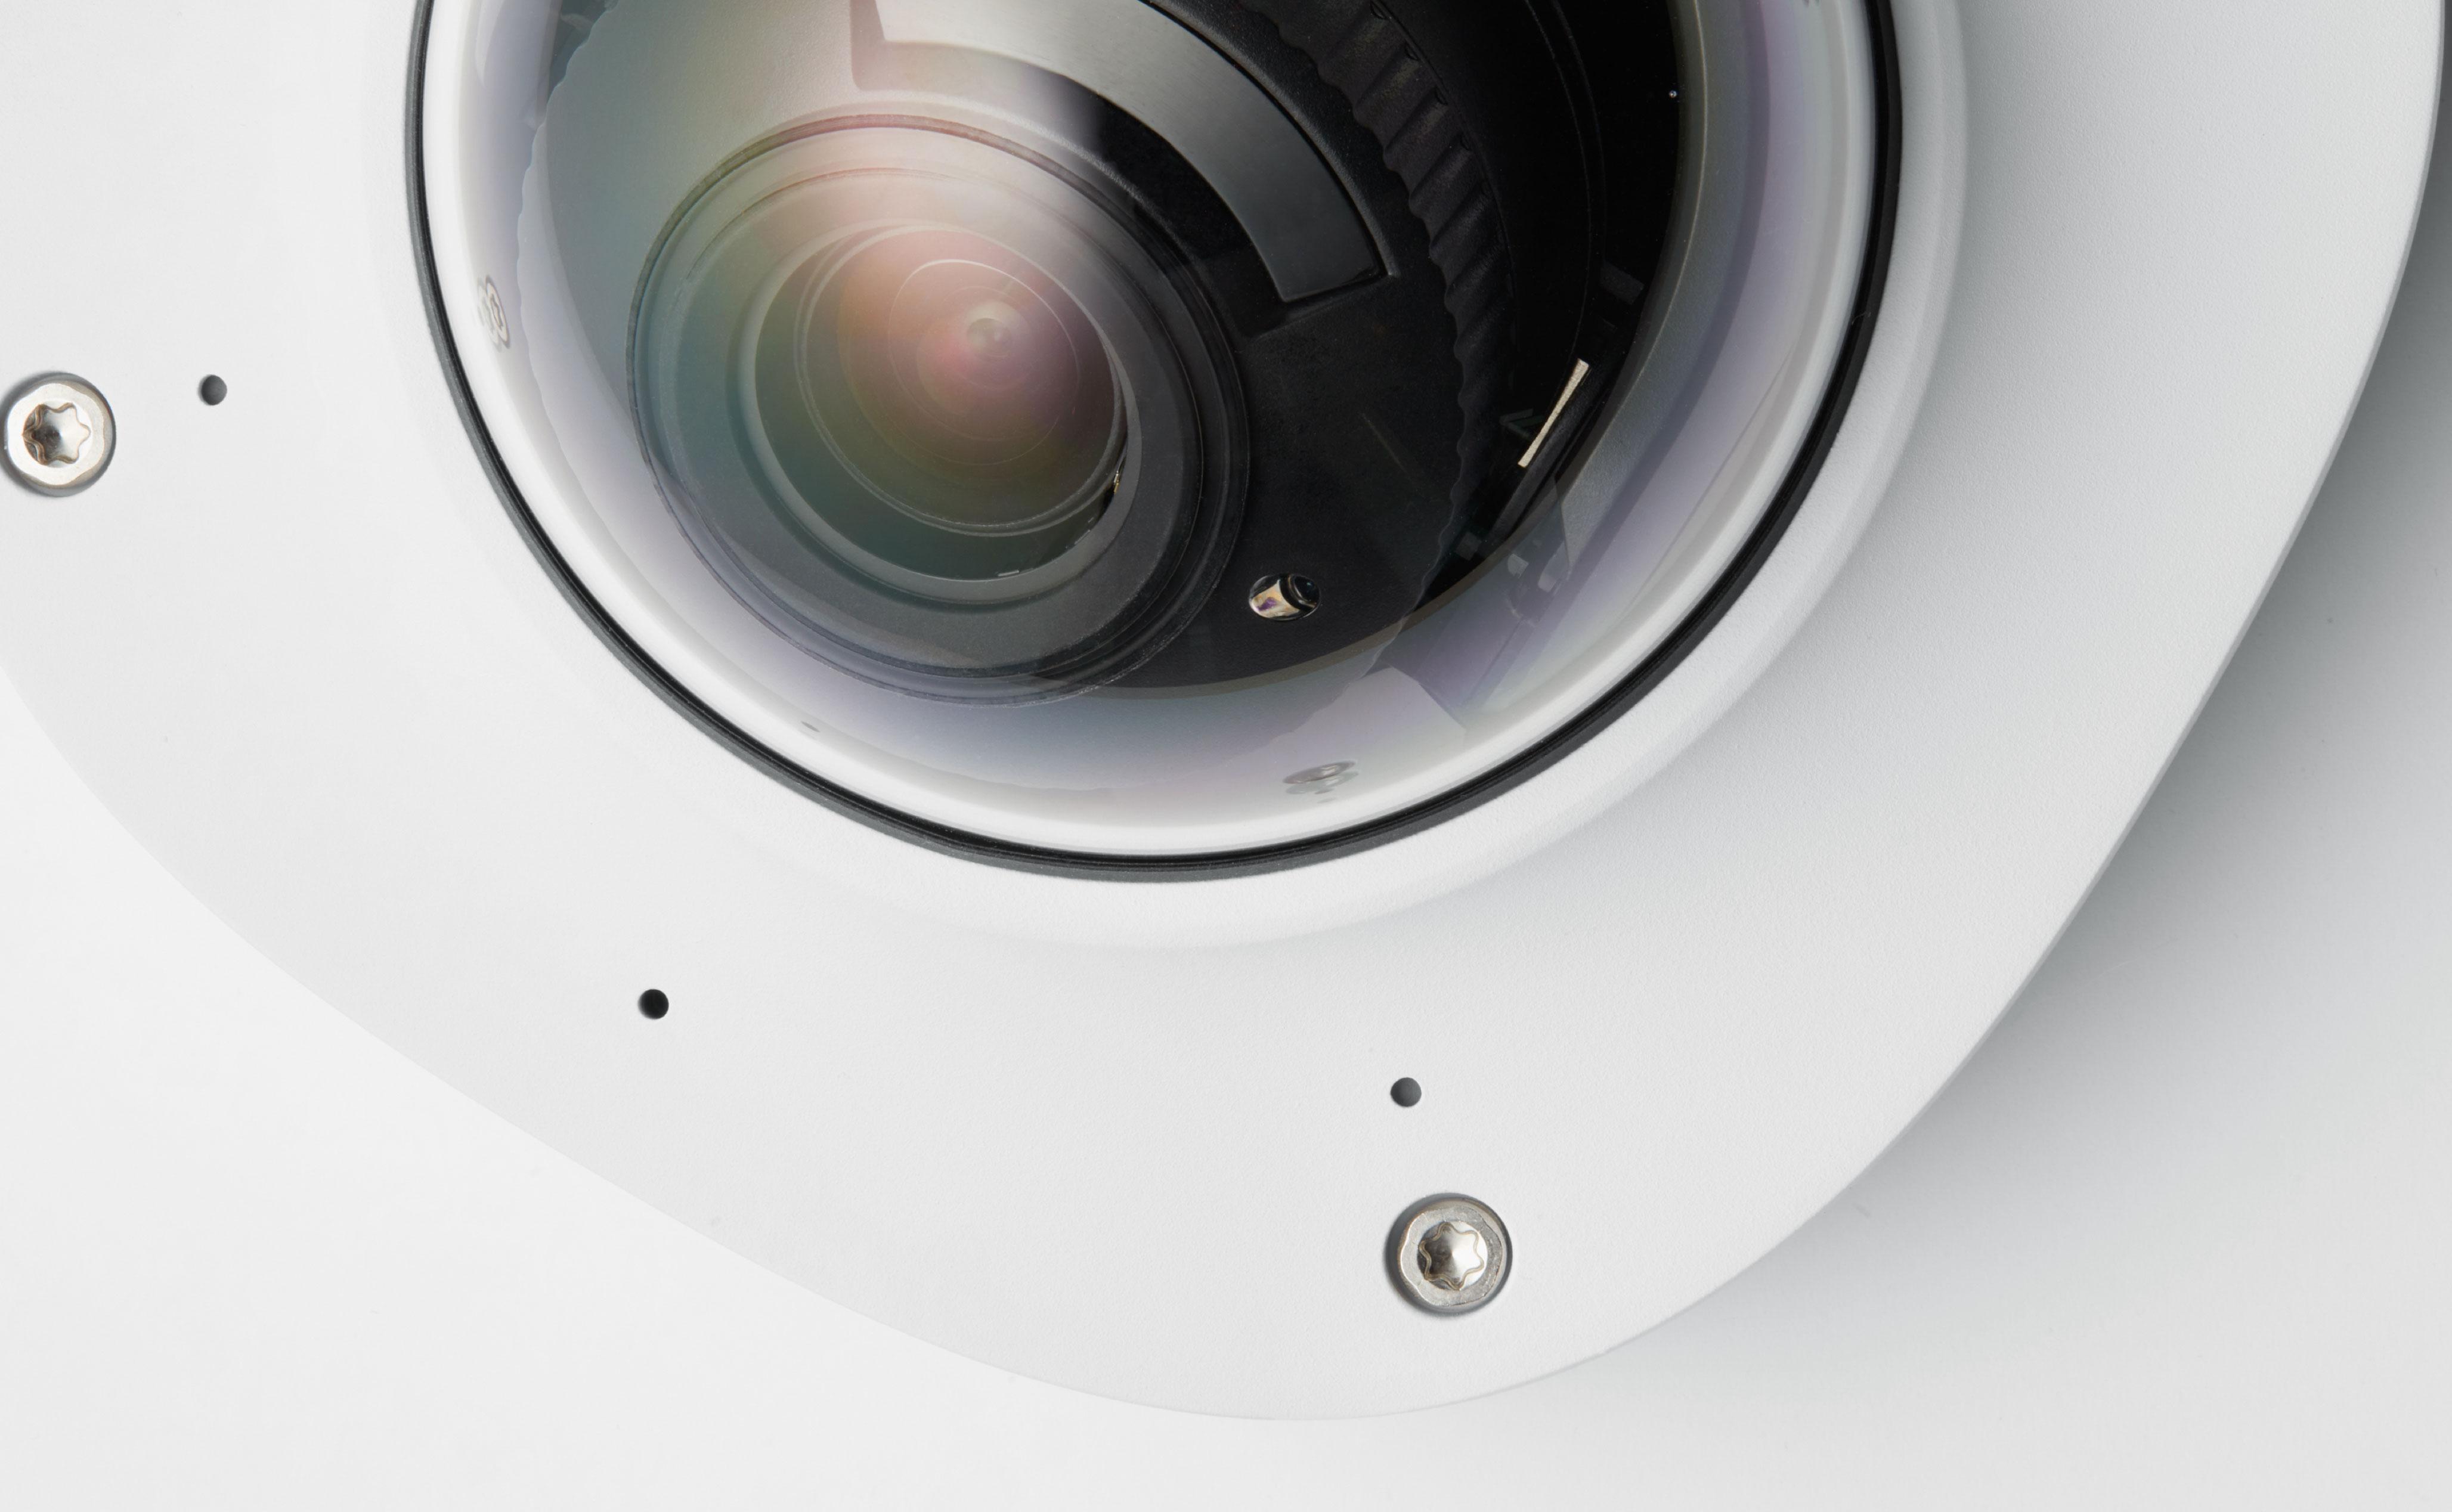 Image - Close up white 1